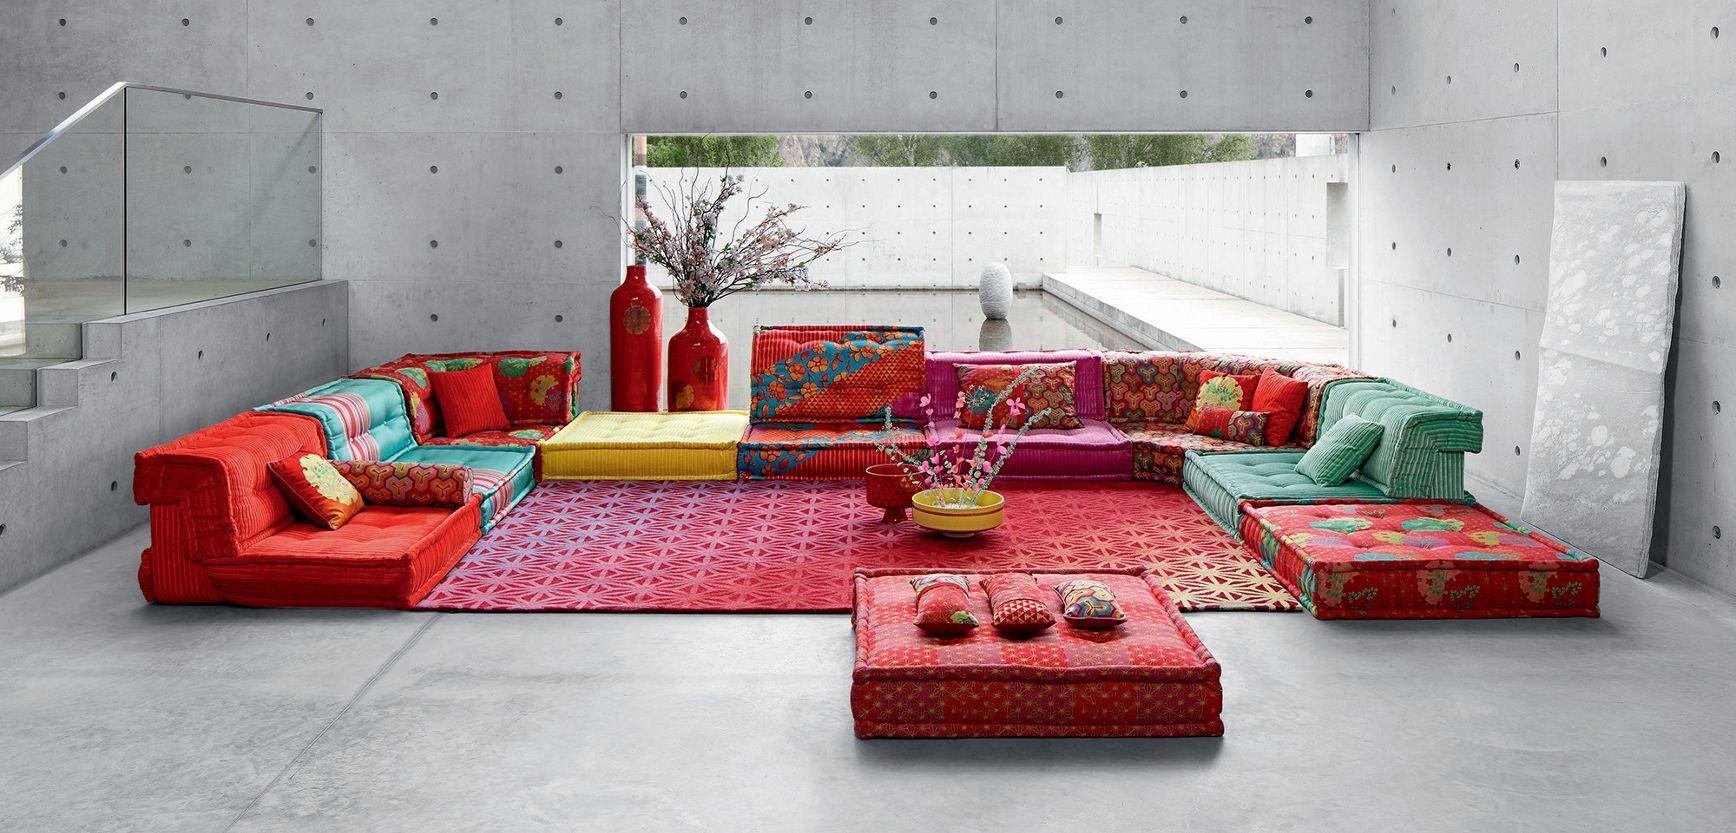 mah jong sofa roche bobois 401 e sopris mah jong sofa sofa rh pinterest com